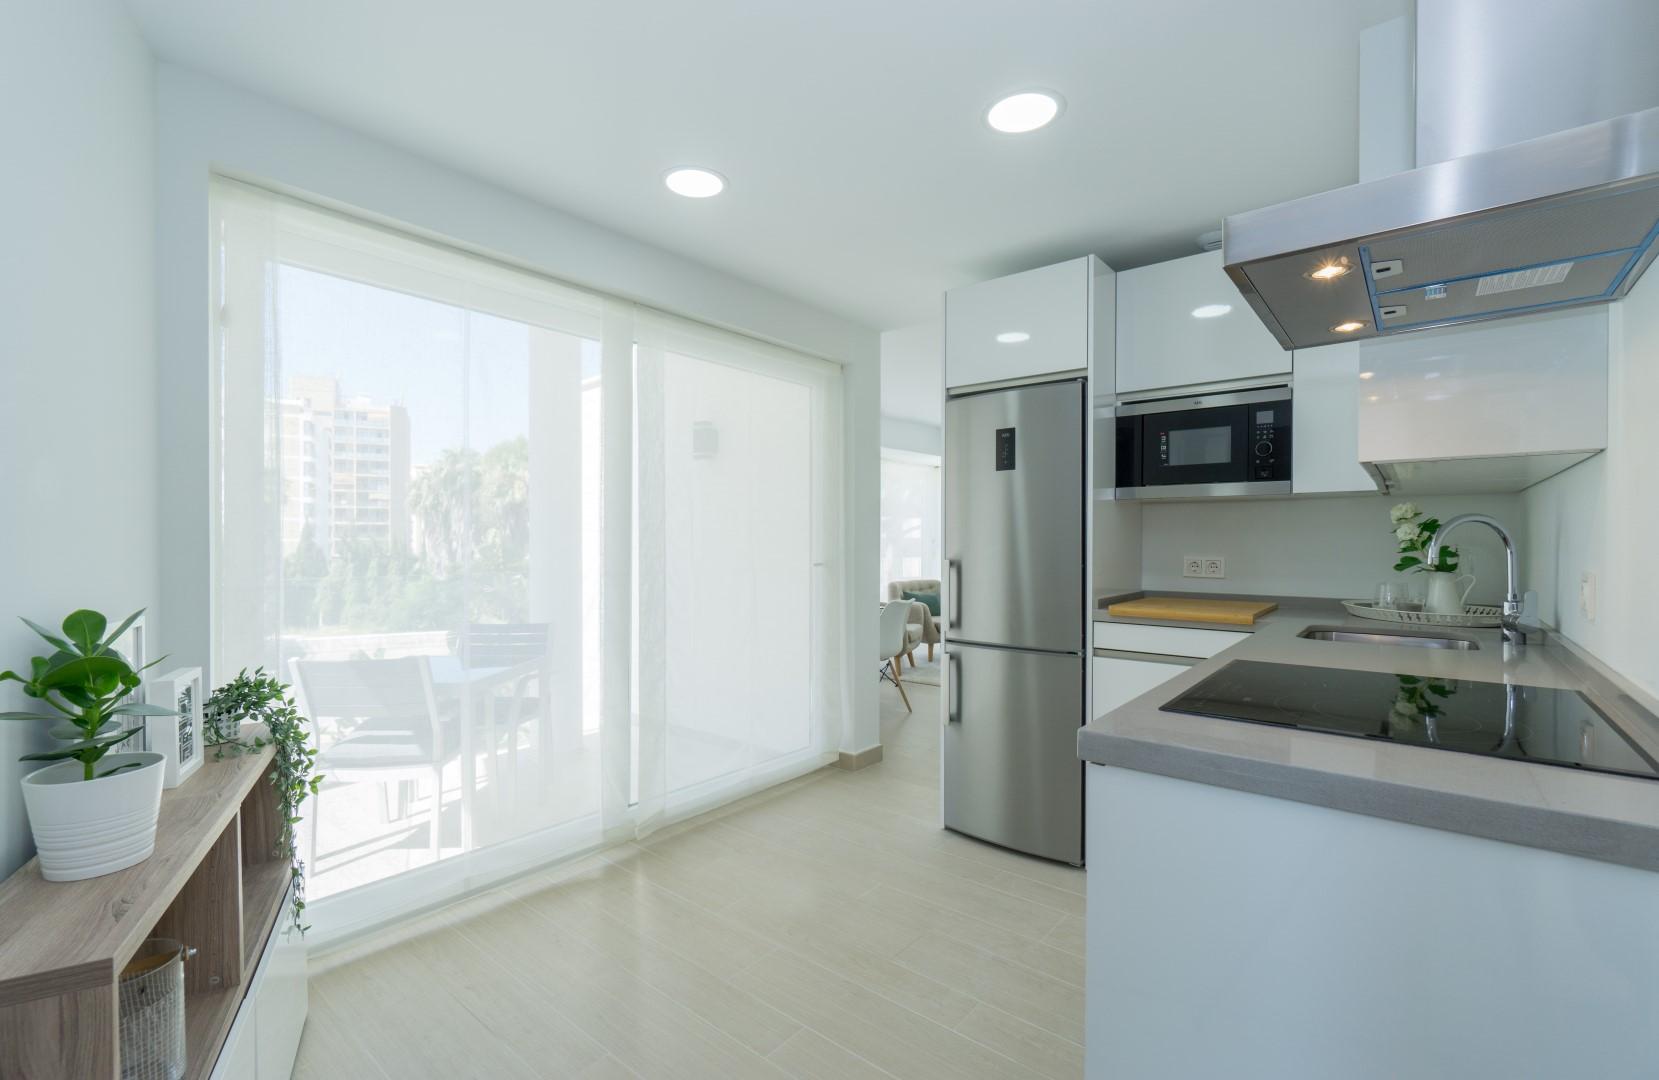 Apartment in Benalmadena MA3142741 8